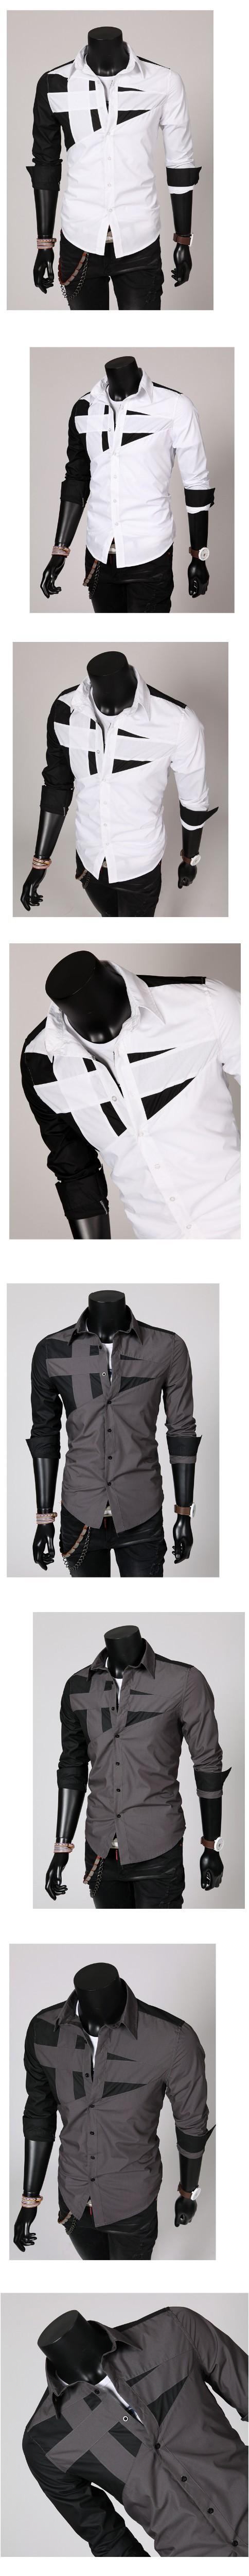 camisas slim fit, camisa slim fit, camisa slim fit masculina, camisas slim fit masculina, camisa masculina slim fit , camisa social slim fit, camisa social slim fit masculina, camisa social slim fit luxo, camisas social slim fit, lojas de roupas, loja de roupas, loja de roupa, lojas de roupas femininas, lojas de roupa, loja de roupas femininas, camisa social slim, camisas sociais slim, camisa slim social, camisas social slim, camisas slim, camisa social slim masculina, camisa social masculina slim, camisa slim masculina, camisa masculina slim, roupas masculinas, roupa masculina, roupas masculina, roupas da moda masculina, roupas infantil masculina, lojas de roupas online, loja de roupas online, lojas online de roupas, loja de roupa online, loja online roupas, camisas social masculina, camisa masculina social, calça social masculina, camisas masculinas social, comprar camisa slim fit, onde comprar camisas slim fit, comprar camisa slim fit masculina, terno slim fit comprar , comprar camisa social masculina, comprar camisa social, comprar camisas, comprar camisas masculinas, loja virtual de roupas, loja virtual roupas, loja de roupas virtual, loja virtual de roupas femininas, lojas de roupas masculinas, loja de roupa masculina, lojas de roupa masculina, lojas roupas masculinas, lojas online de roupas femininas, lojas de roupas femininas online, loja de roupas femininas online, roupas masculinas online, lojas de roupas masculinas online, loja de roupas masculinas online, camisa social feminina, camisas social feminina, calça social feminina, camisa feminina social, blusa social feminina, roupa social masculina, roupas social masculina, roupa social, roupa social masculino, roupas masculinas social, terno slim fit, ternos slim fit, ternos slim fit masculino, slim fit terno, ternos slim fit lojas, camisa social masculino, sapato social masculino, blusa social masculino, social masculino, cinto social masculino, site de roupas masculinas, roupas de grife masculina, jaqueta